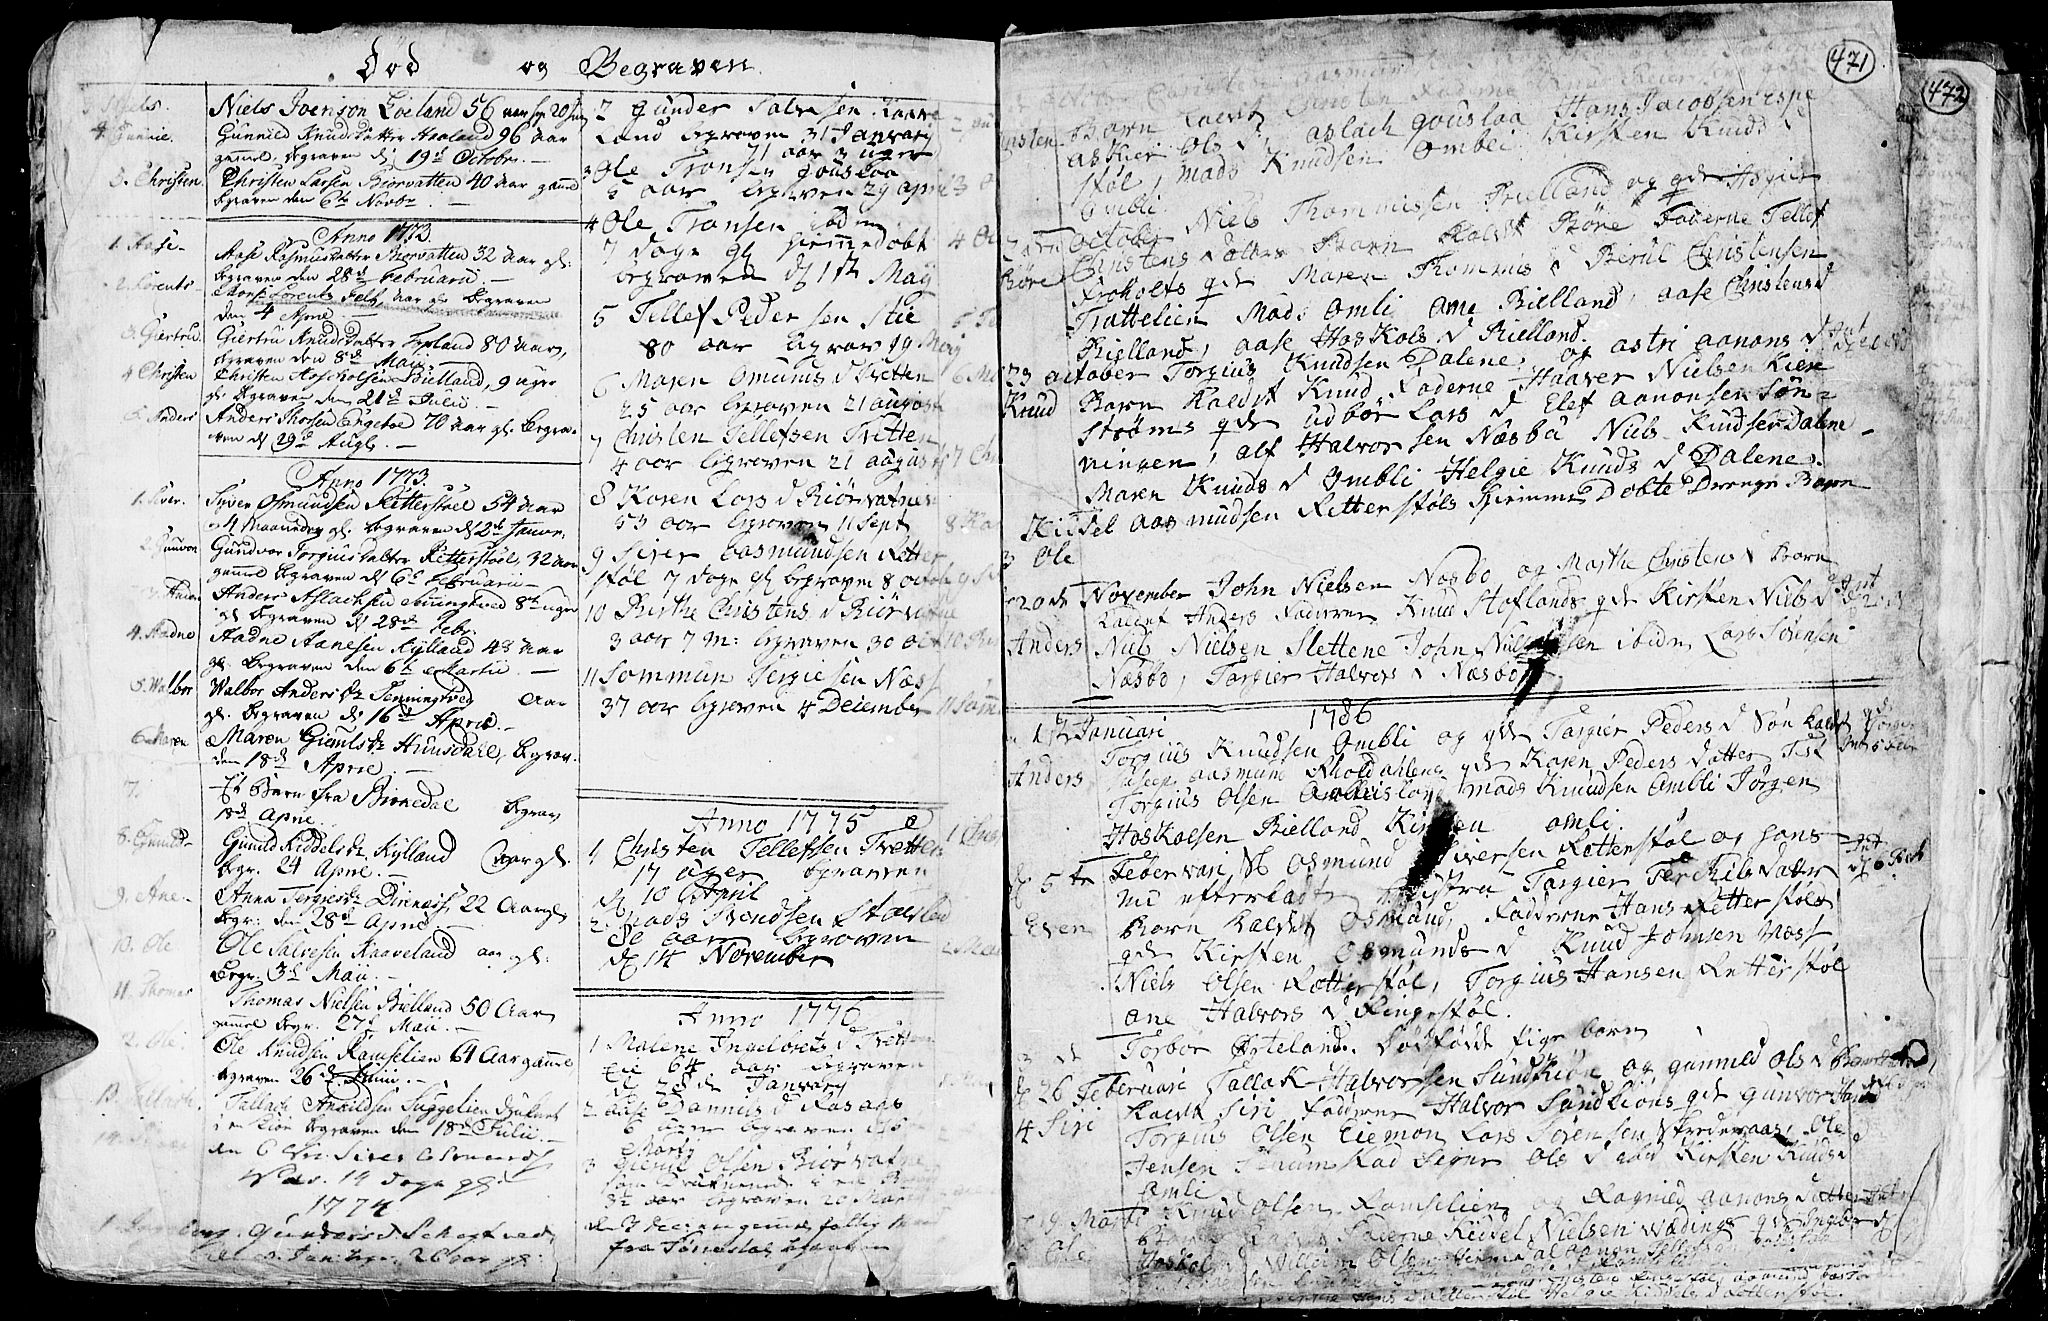 SAK, Hommedal sokneprestkontor, F/Fa/Fab/L0002: Ministerialbok nr. A 2 /3, 1740-1821, s. 471